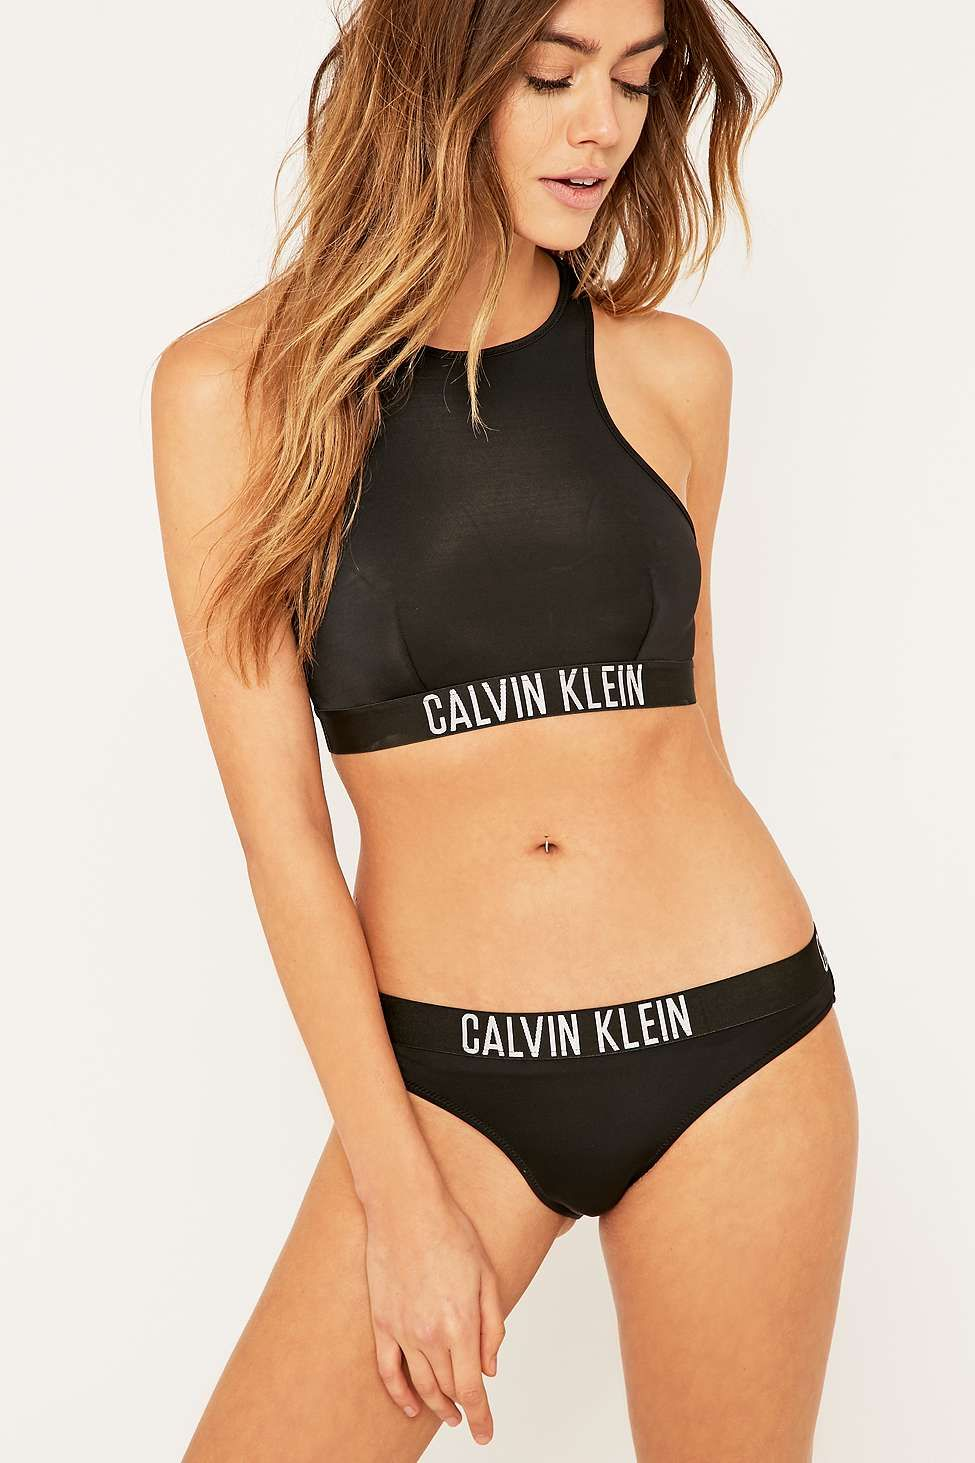 eb8639c8b24be Calvin Klein Black Bralette Bikini Top Clothing